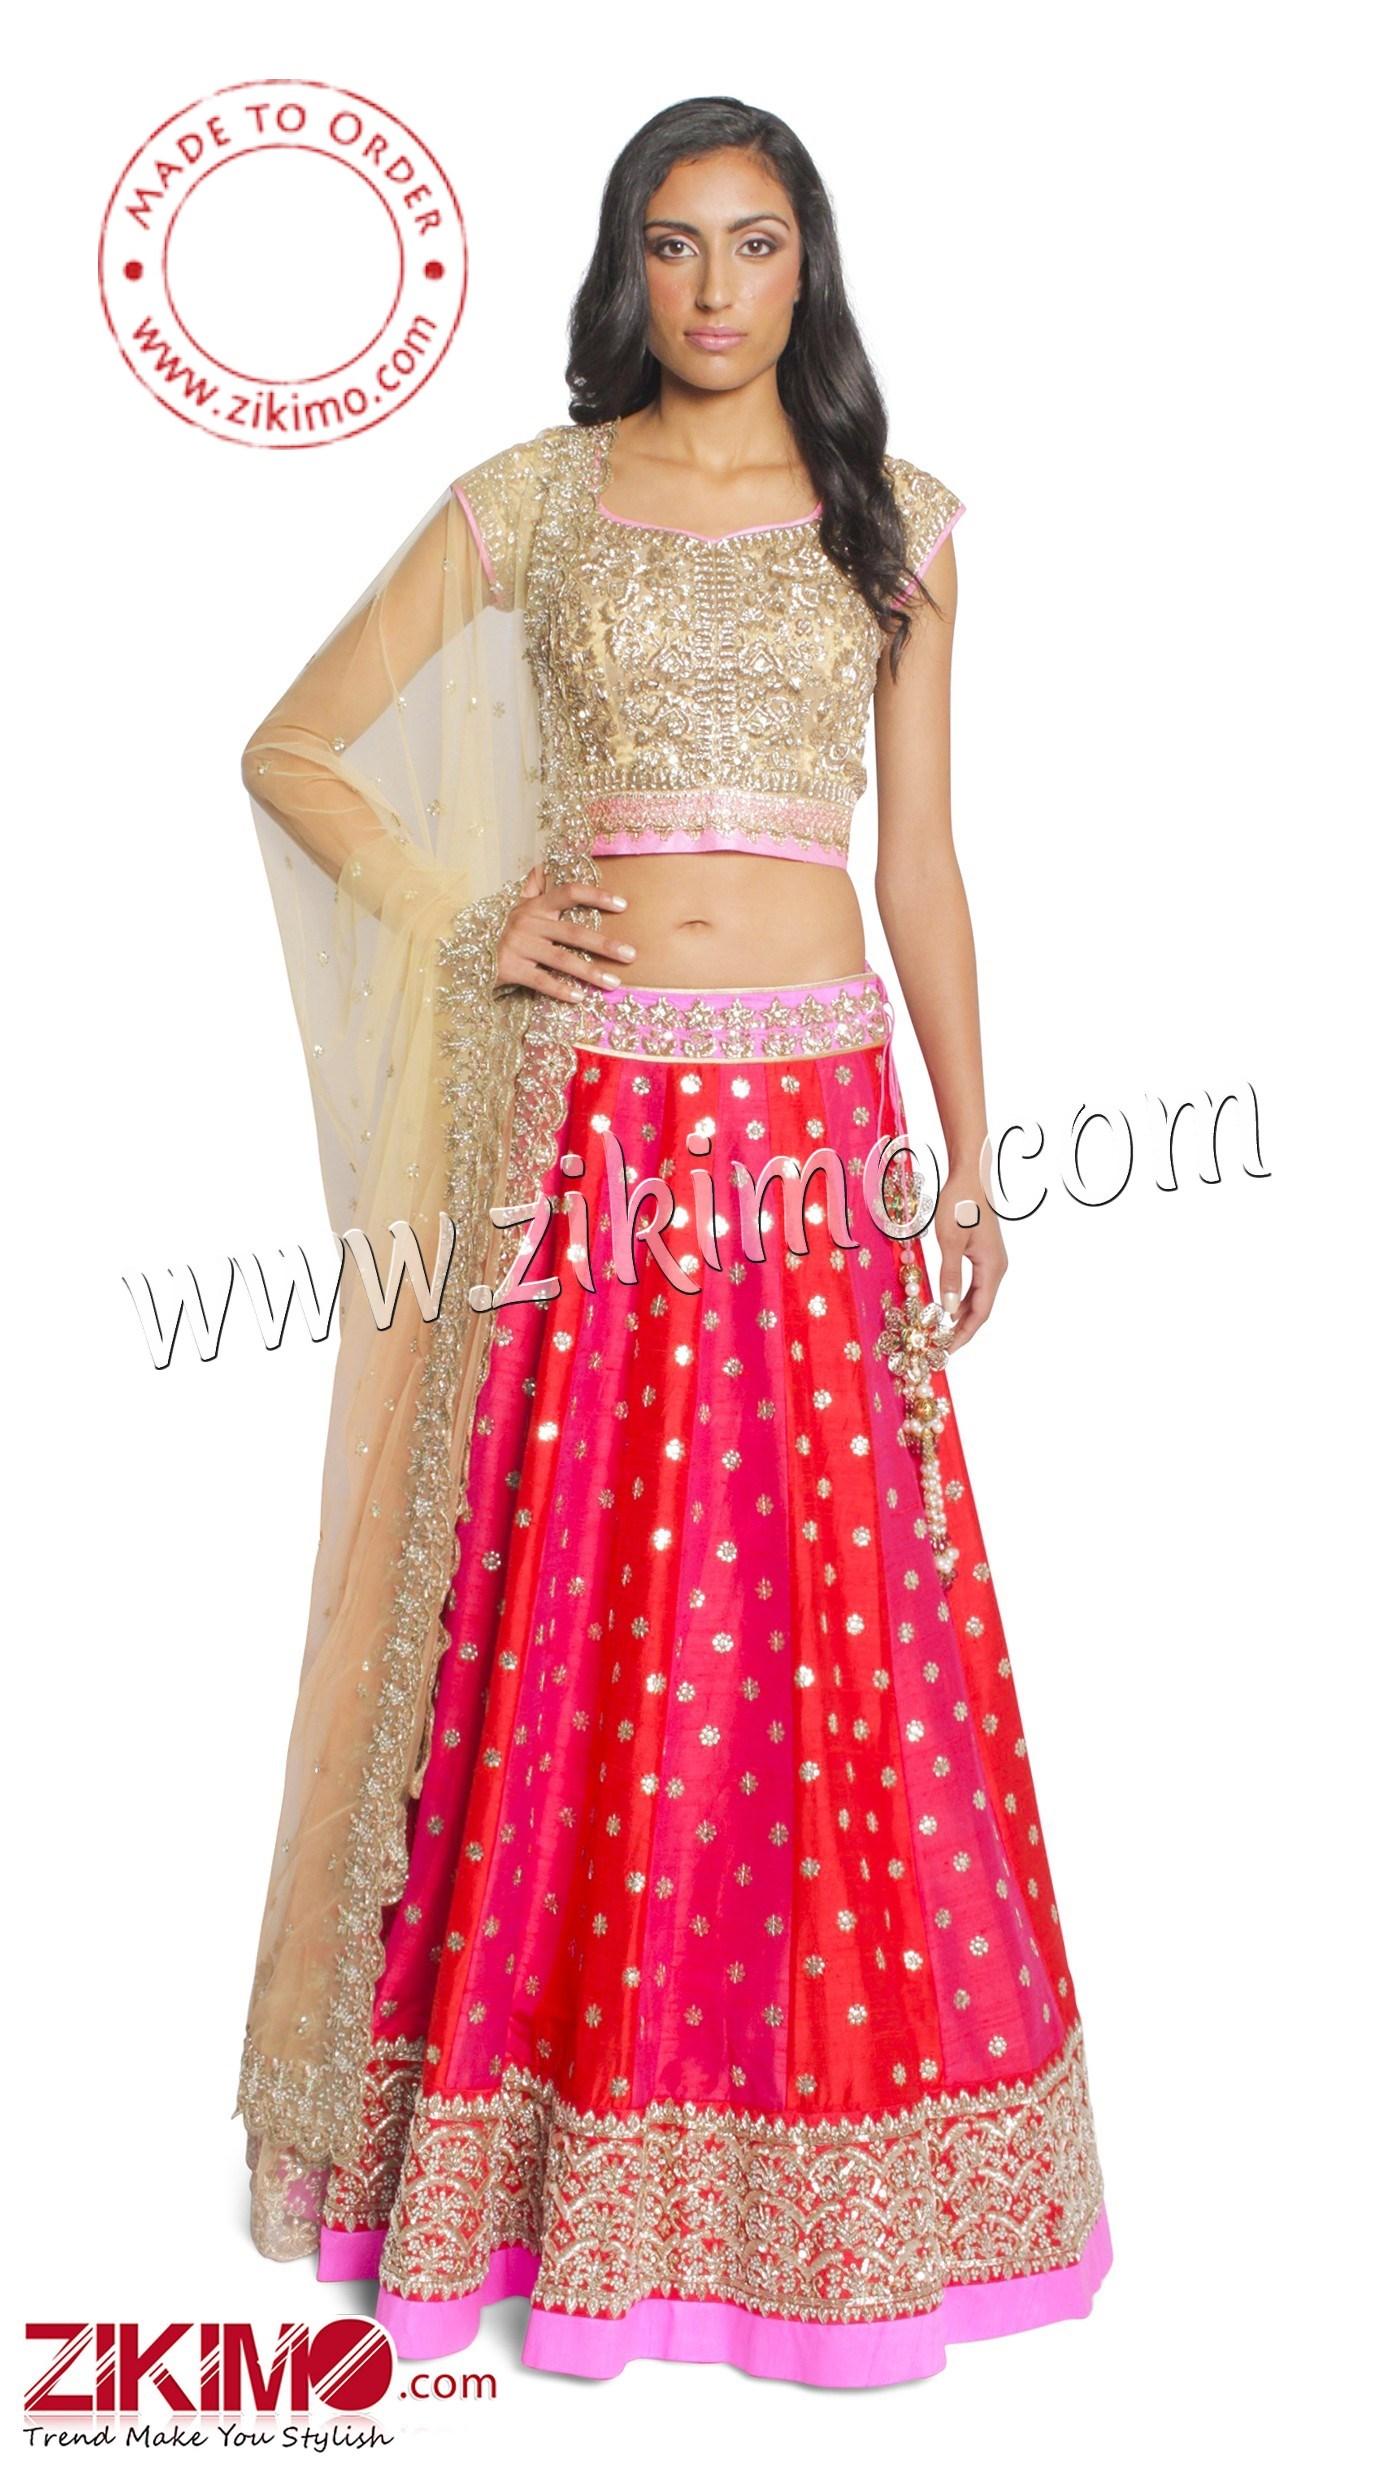 Red And Pink Flared Indian Wedding Lehenga Choli With Matching Dupatta